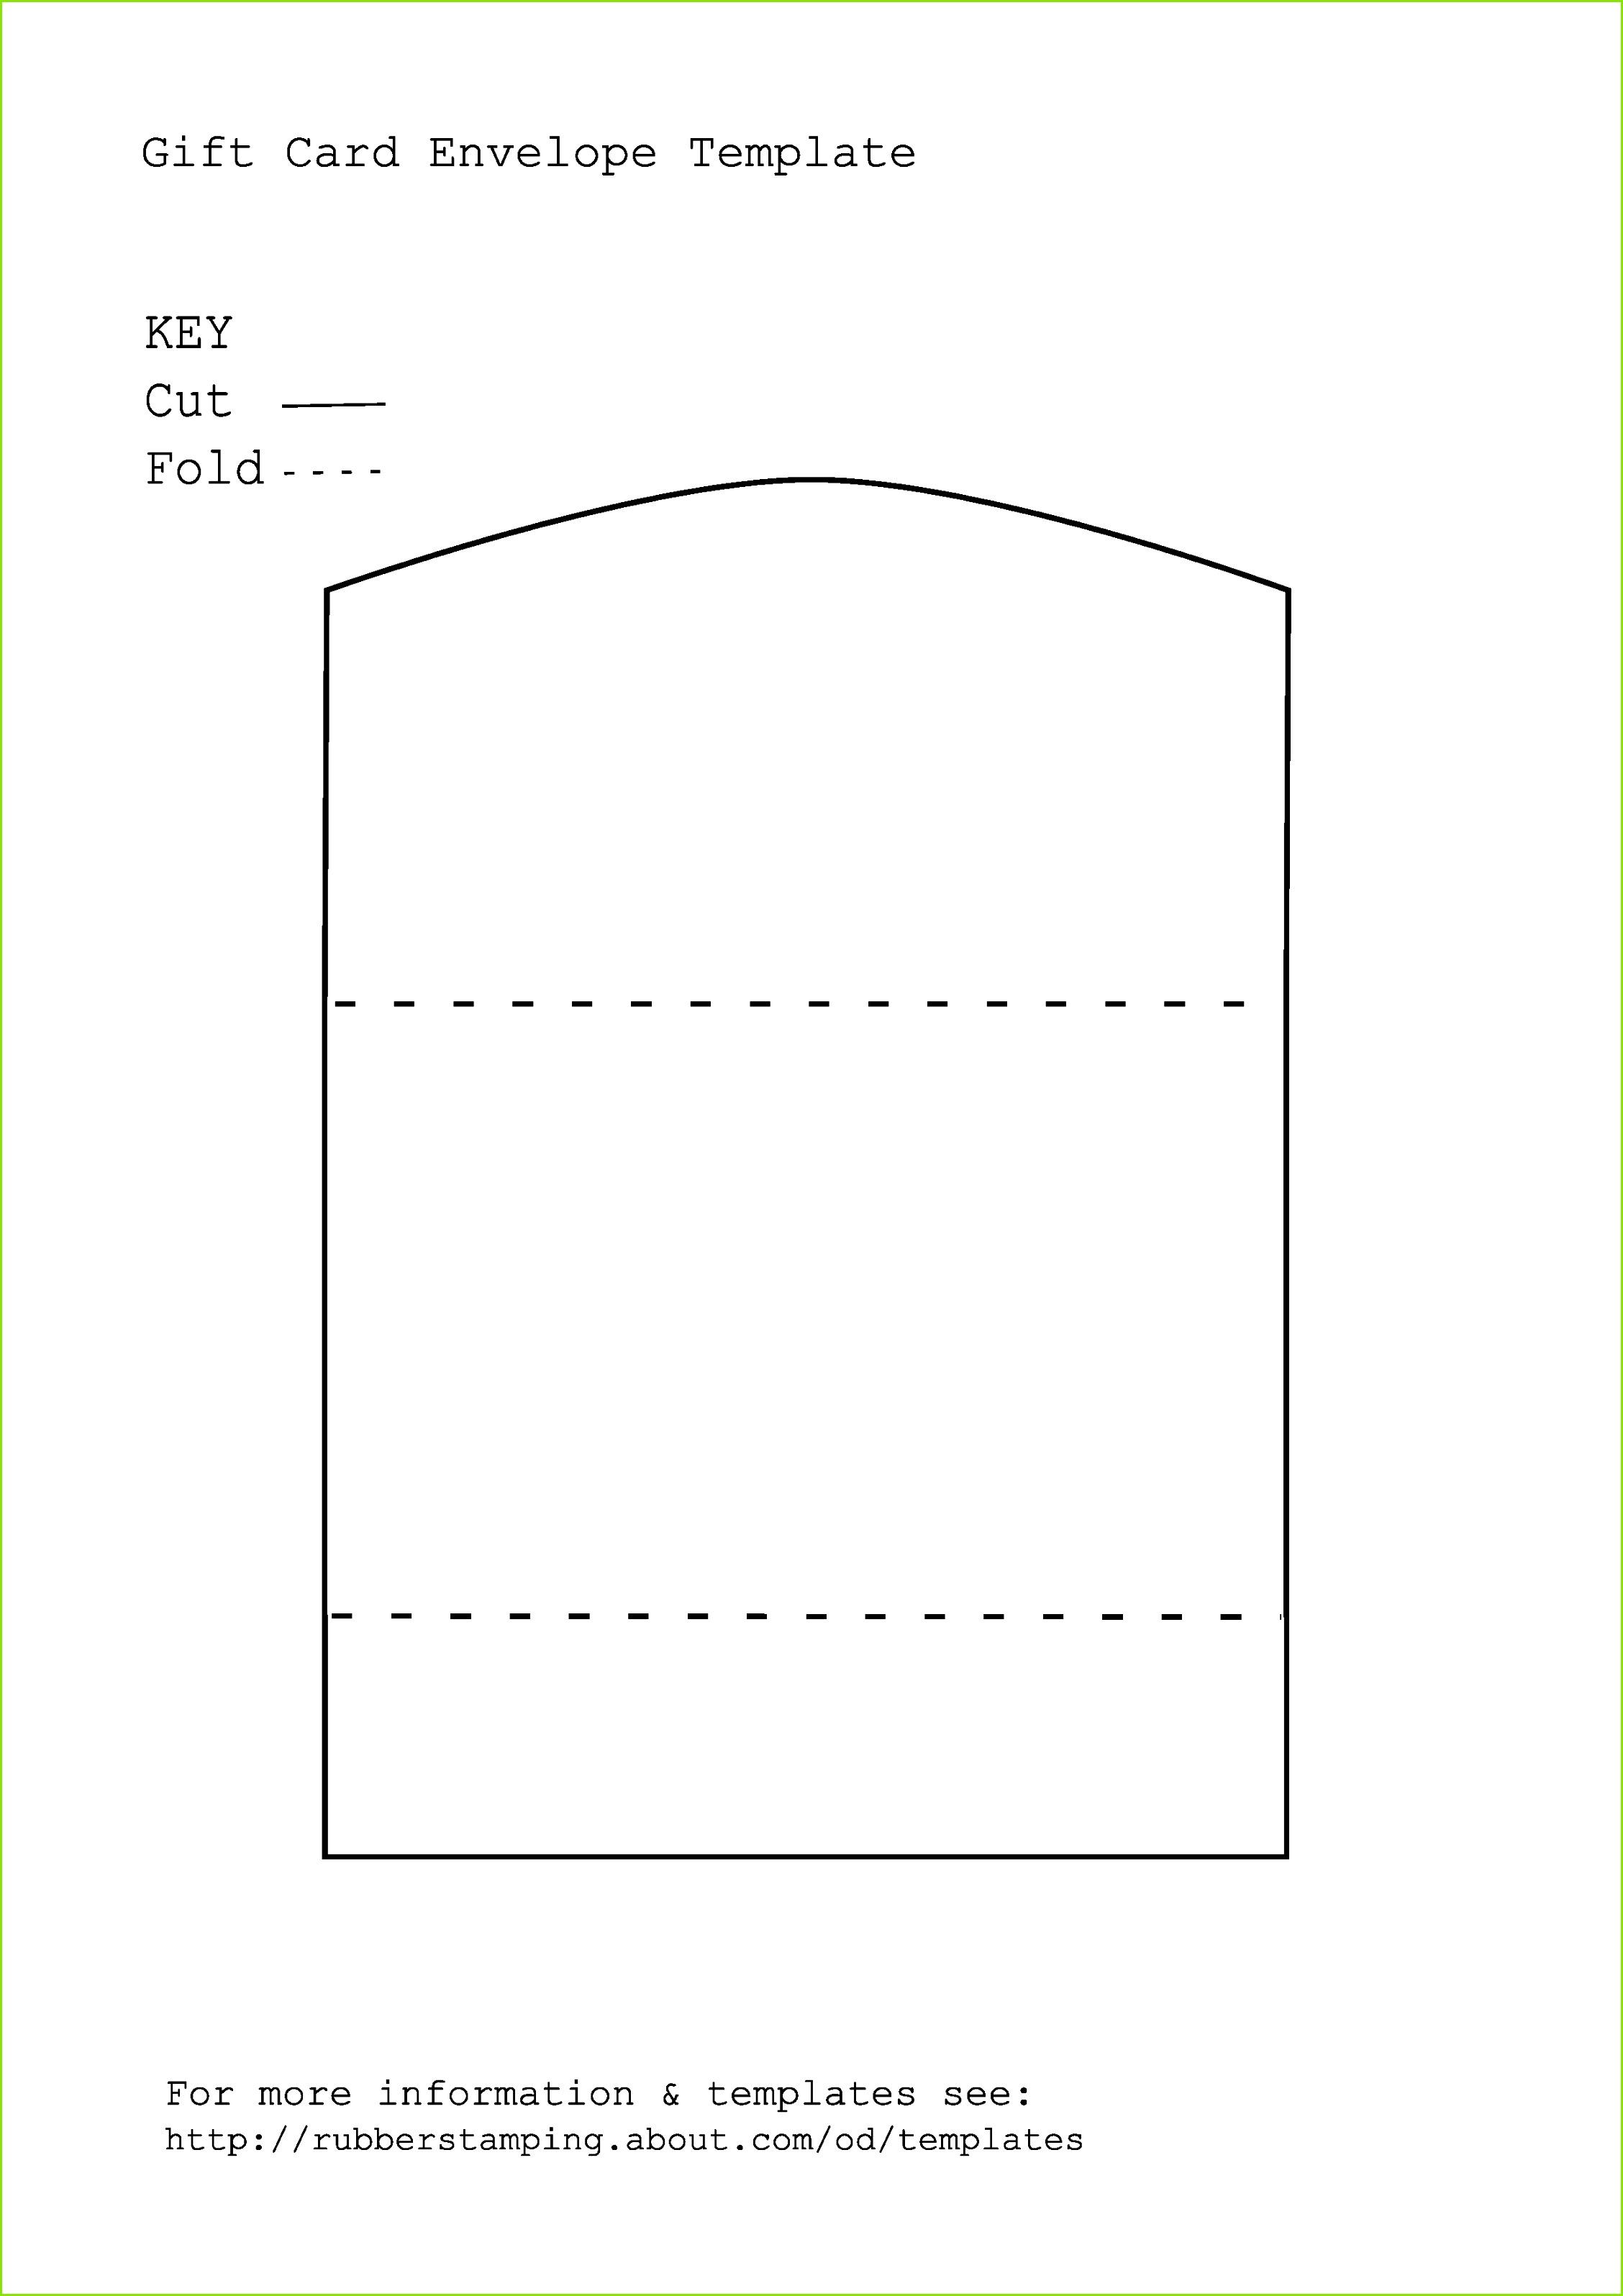 Danksagungskarten Geburt Text Trauer Danksagungskarten Danksagung Trauer Text Schön Danksagung 0d – Scene3